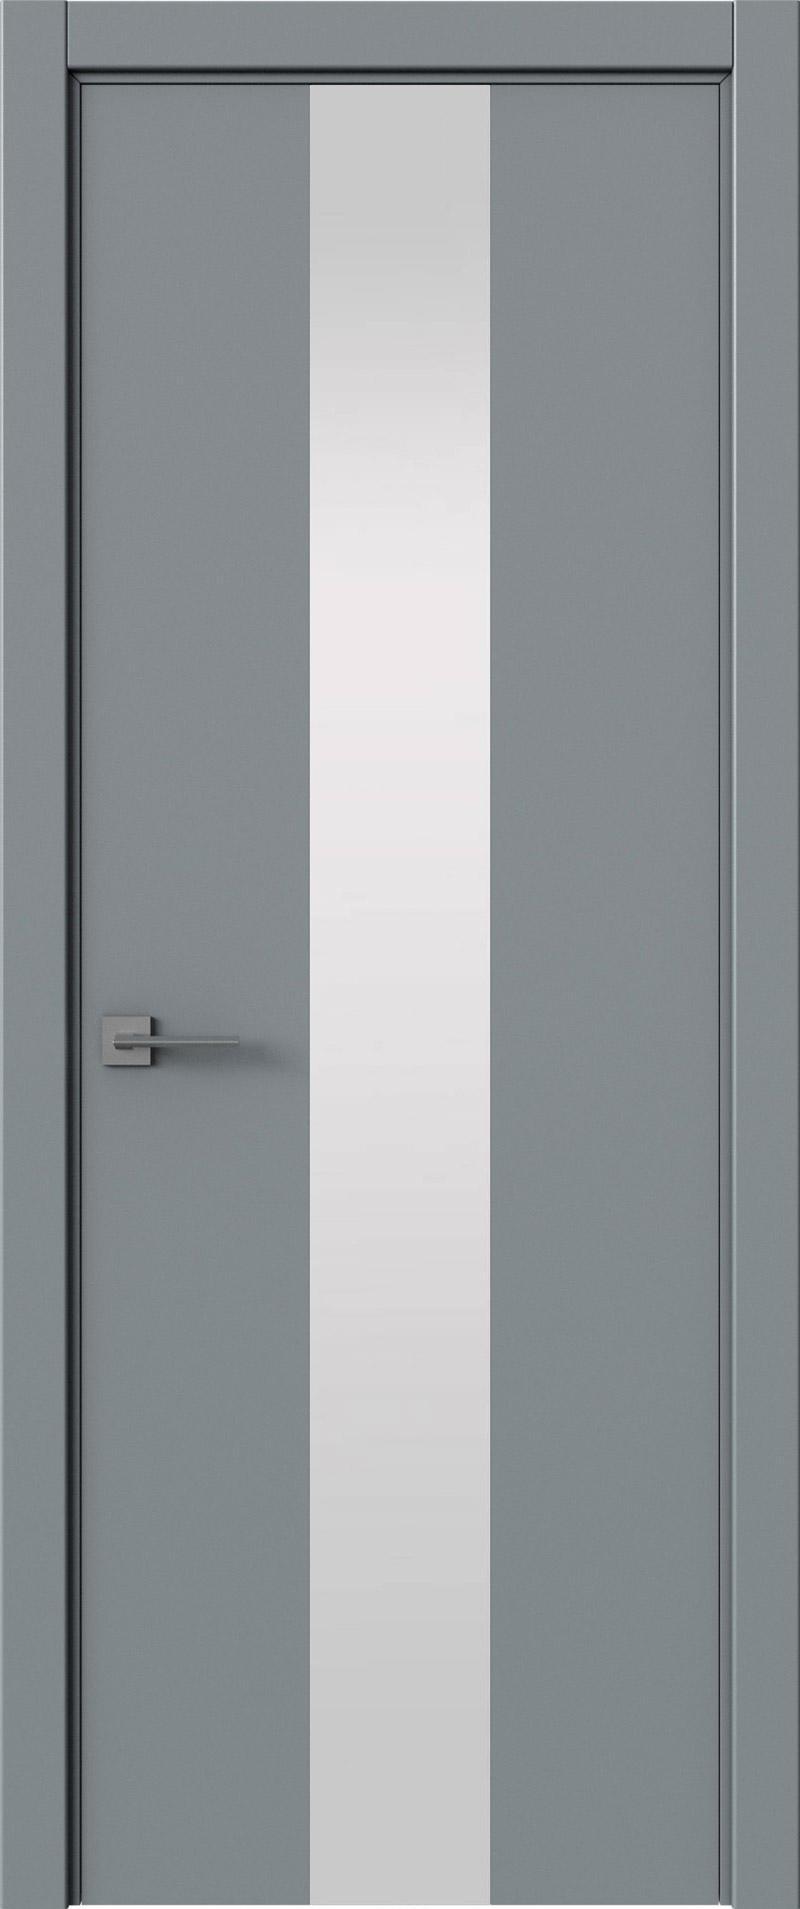 Tivoli Ж-5 цвет - Серебристо-серая эмаль (RAL 7045) Со стеклом (ДО)